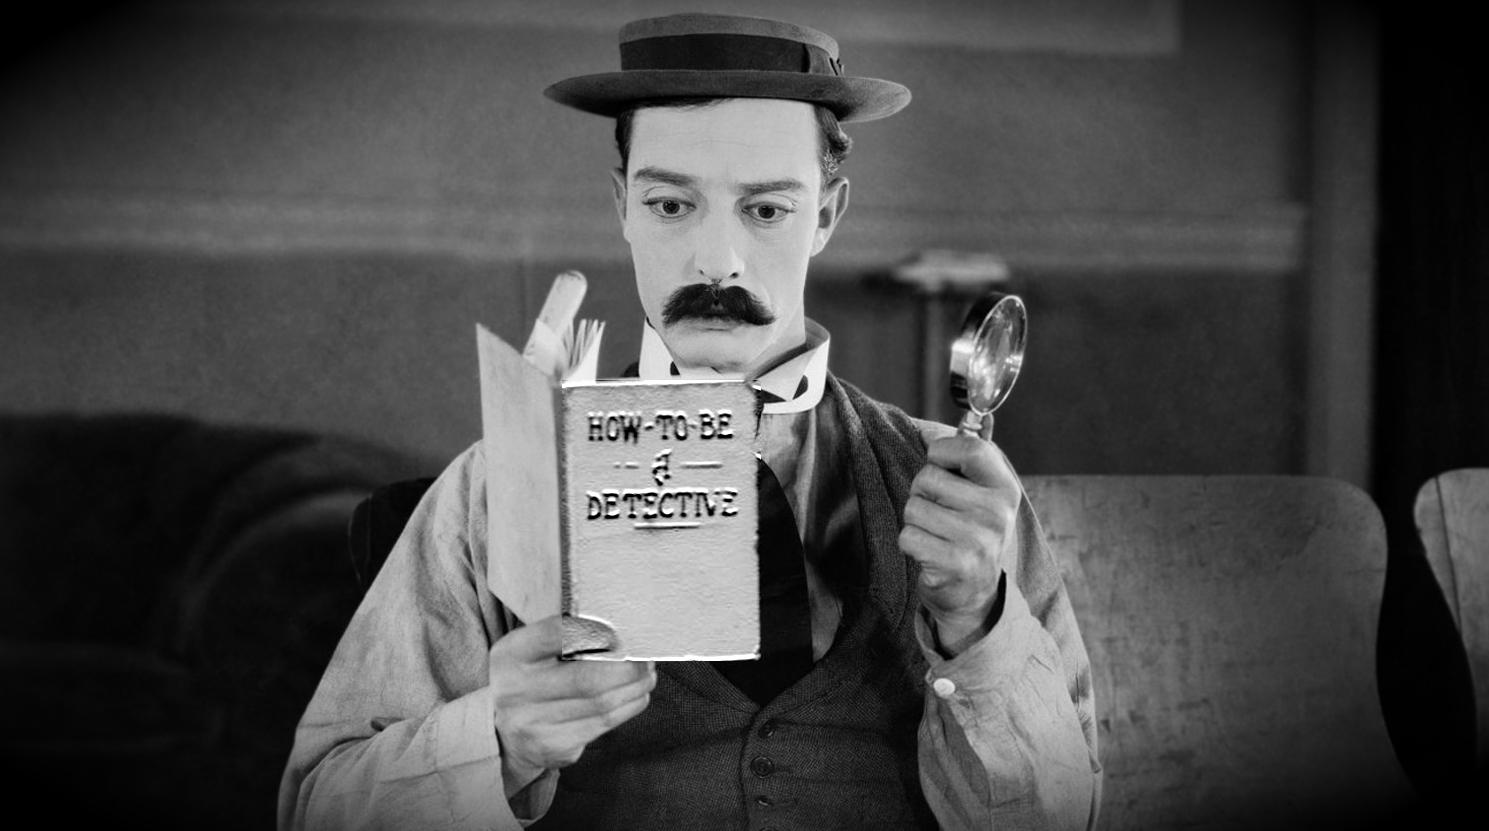 SHERLOCK JR 1924